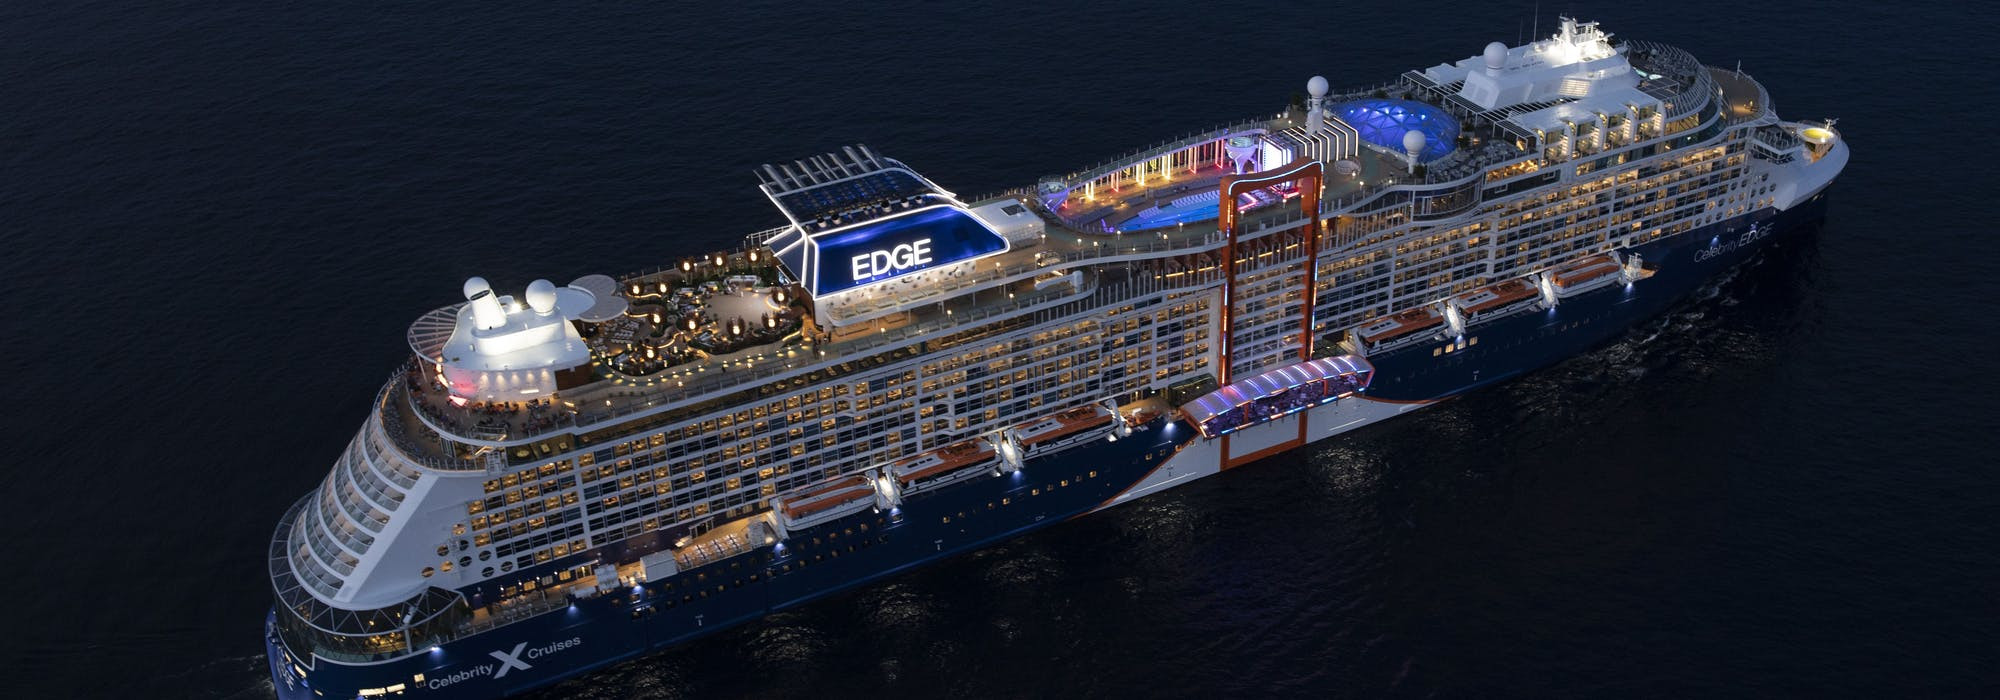 Fartyget Celebrity Edge upplyst i mörkret.